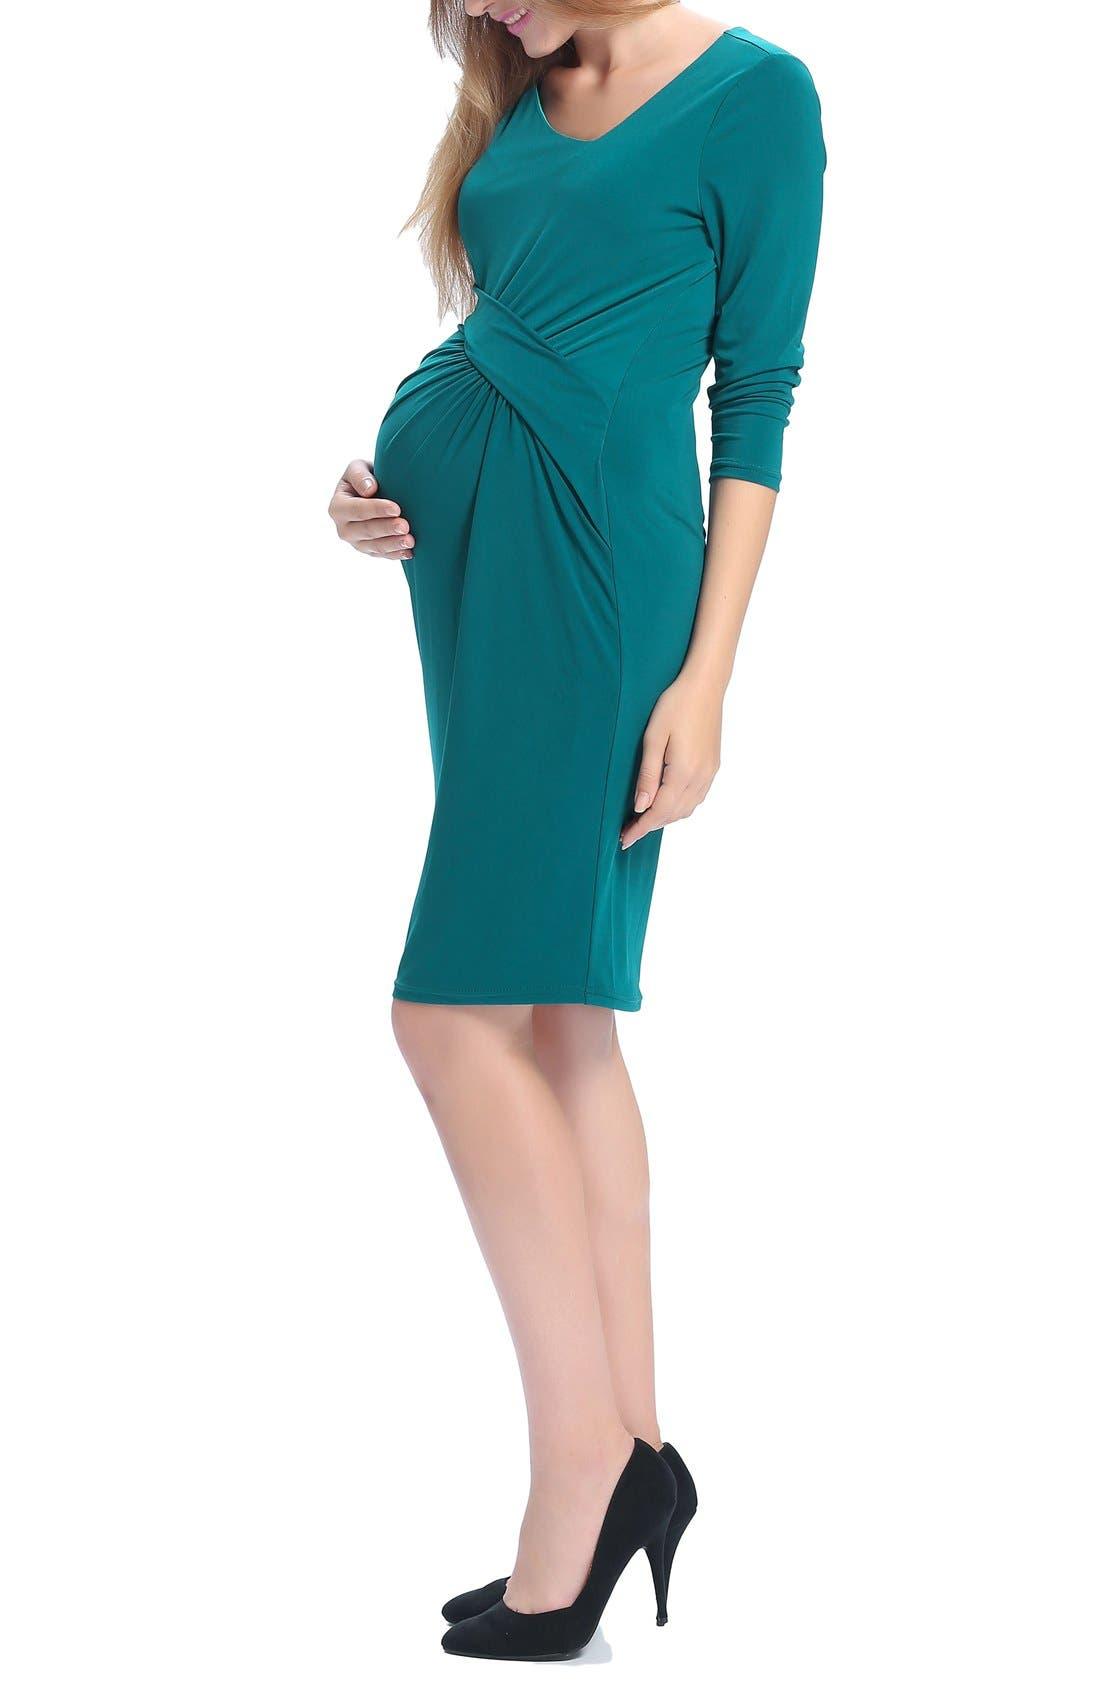 Teagan Body-Con Maternity Dress,                             Alternate thumbnail 7, color,                             TEAL